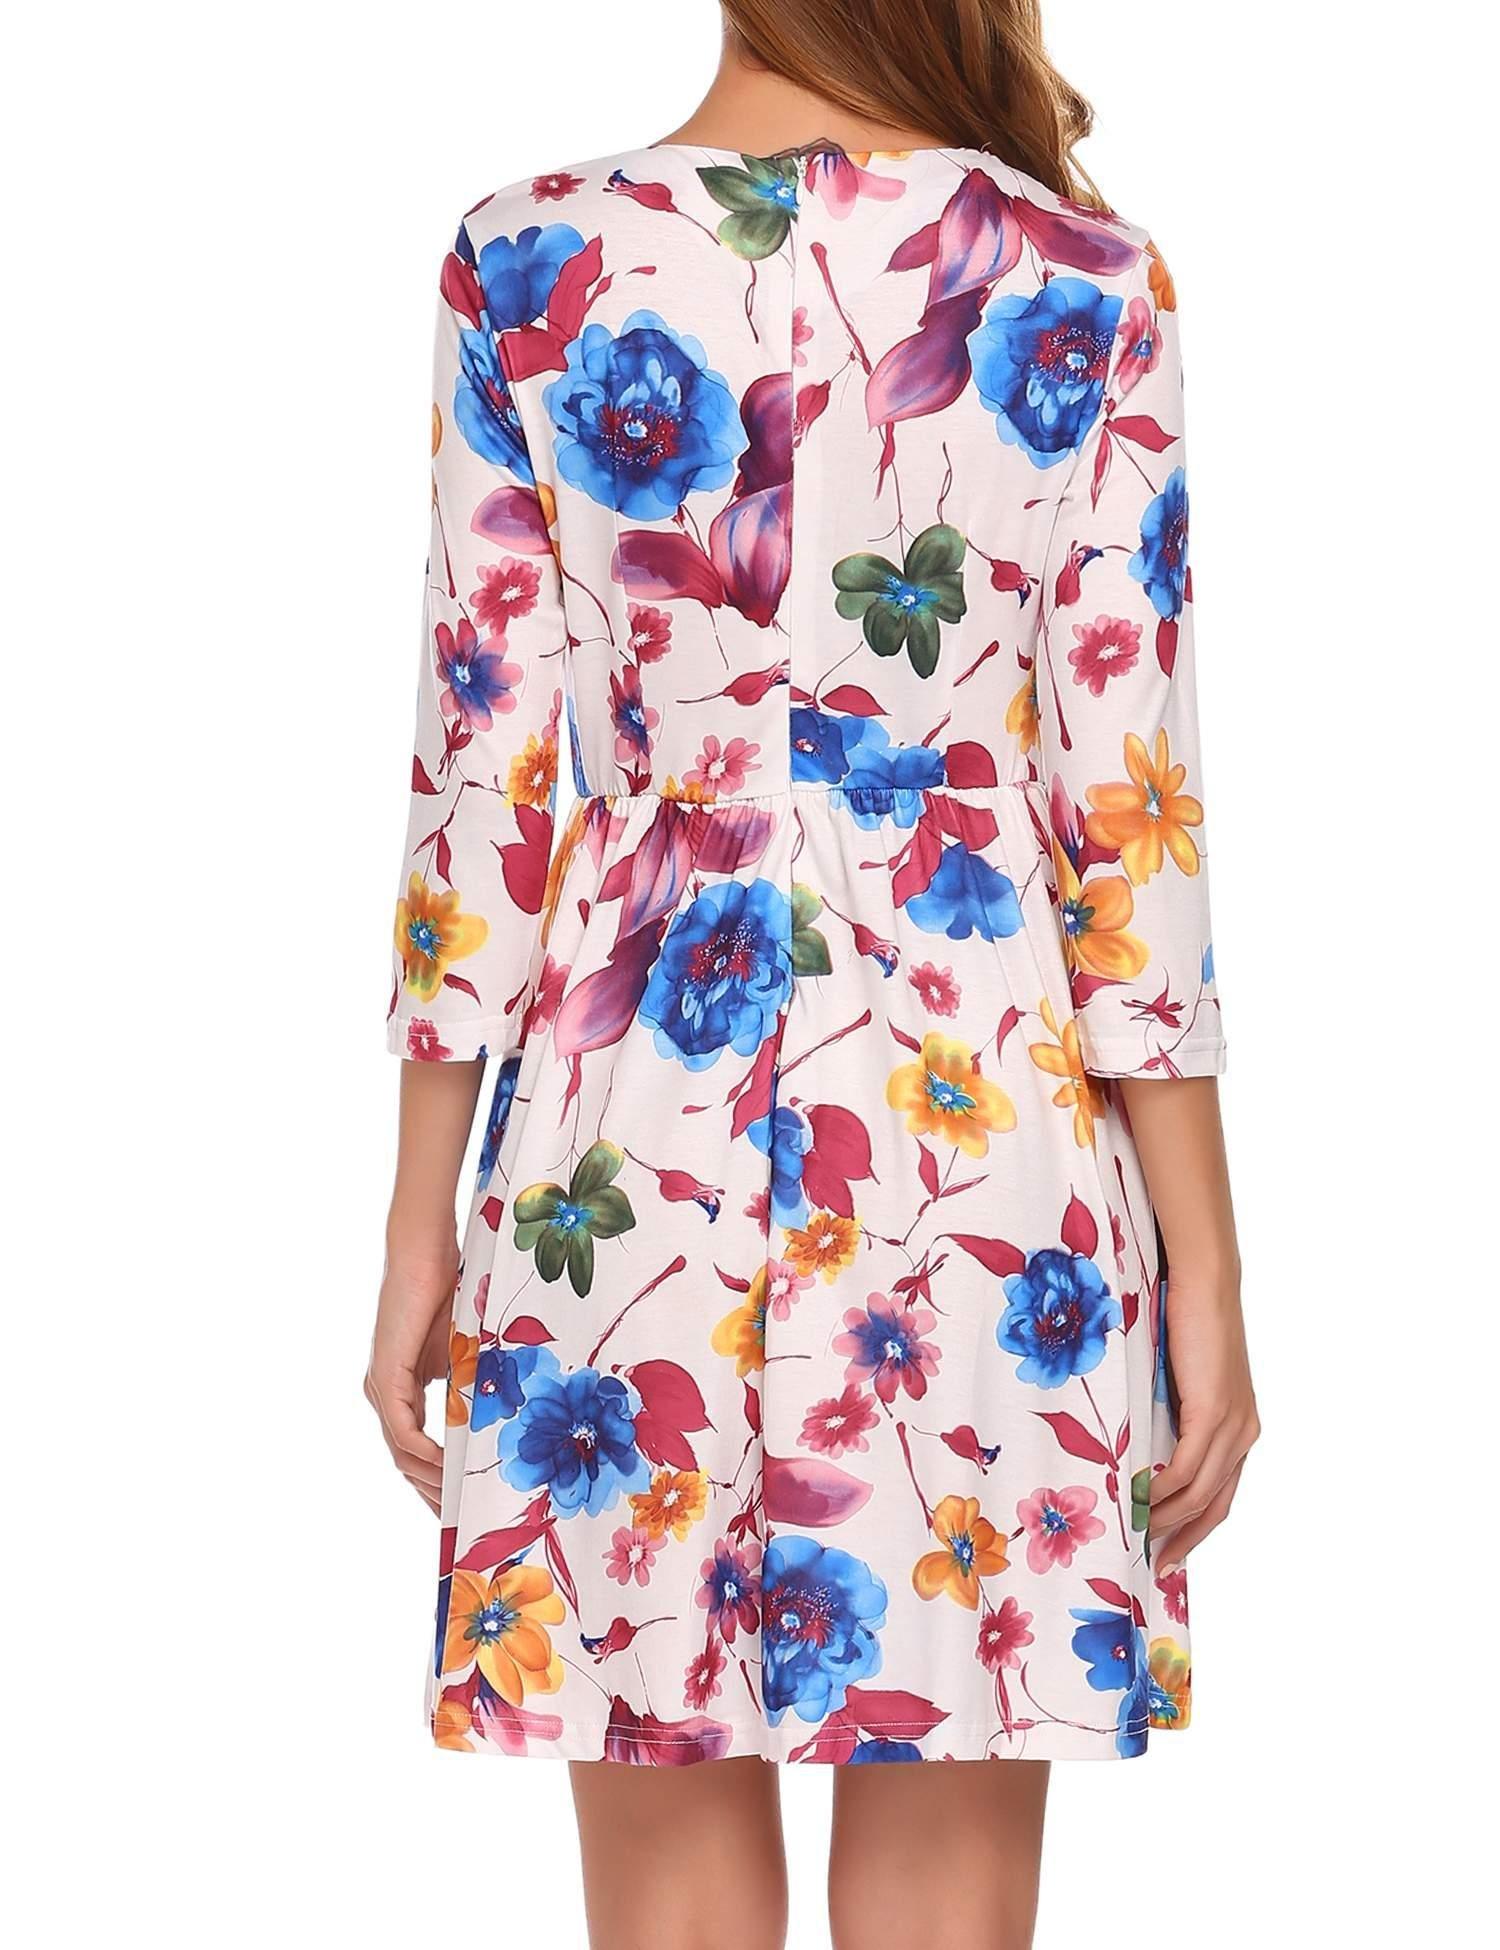 Misakia Women\'s 3/4 Sleeve Floral Print Party Short Dress White,XXL